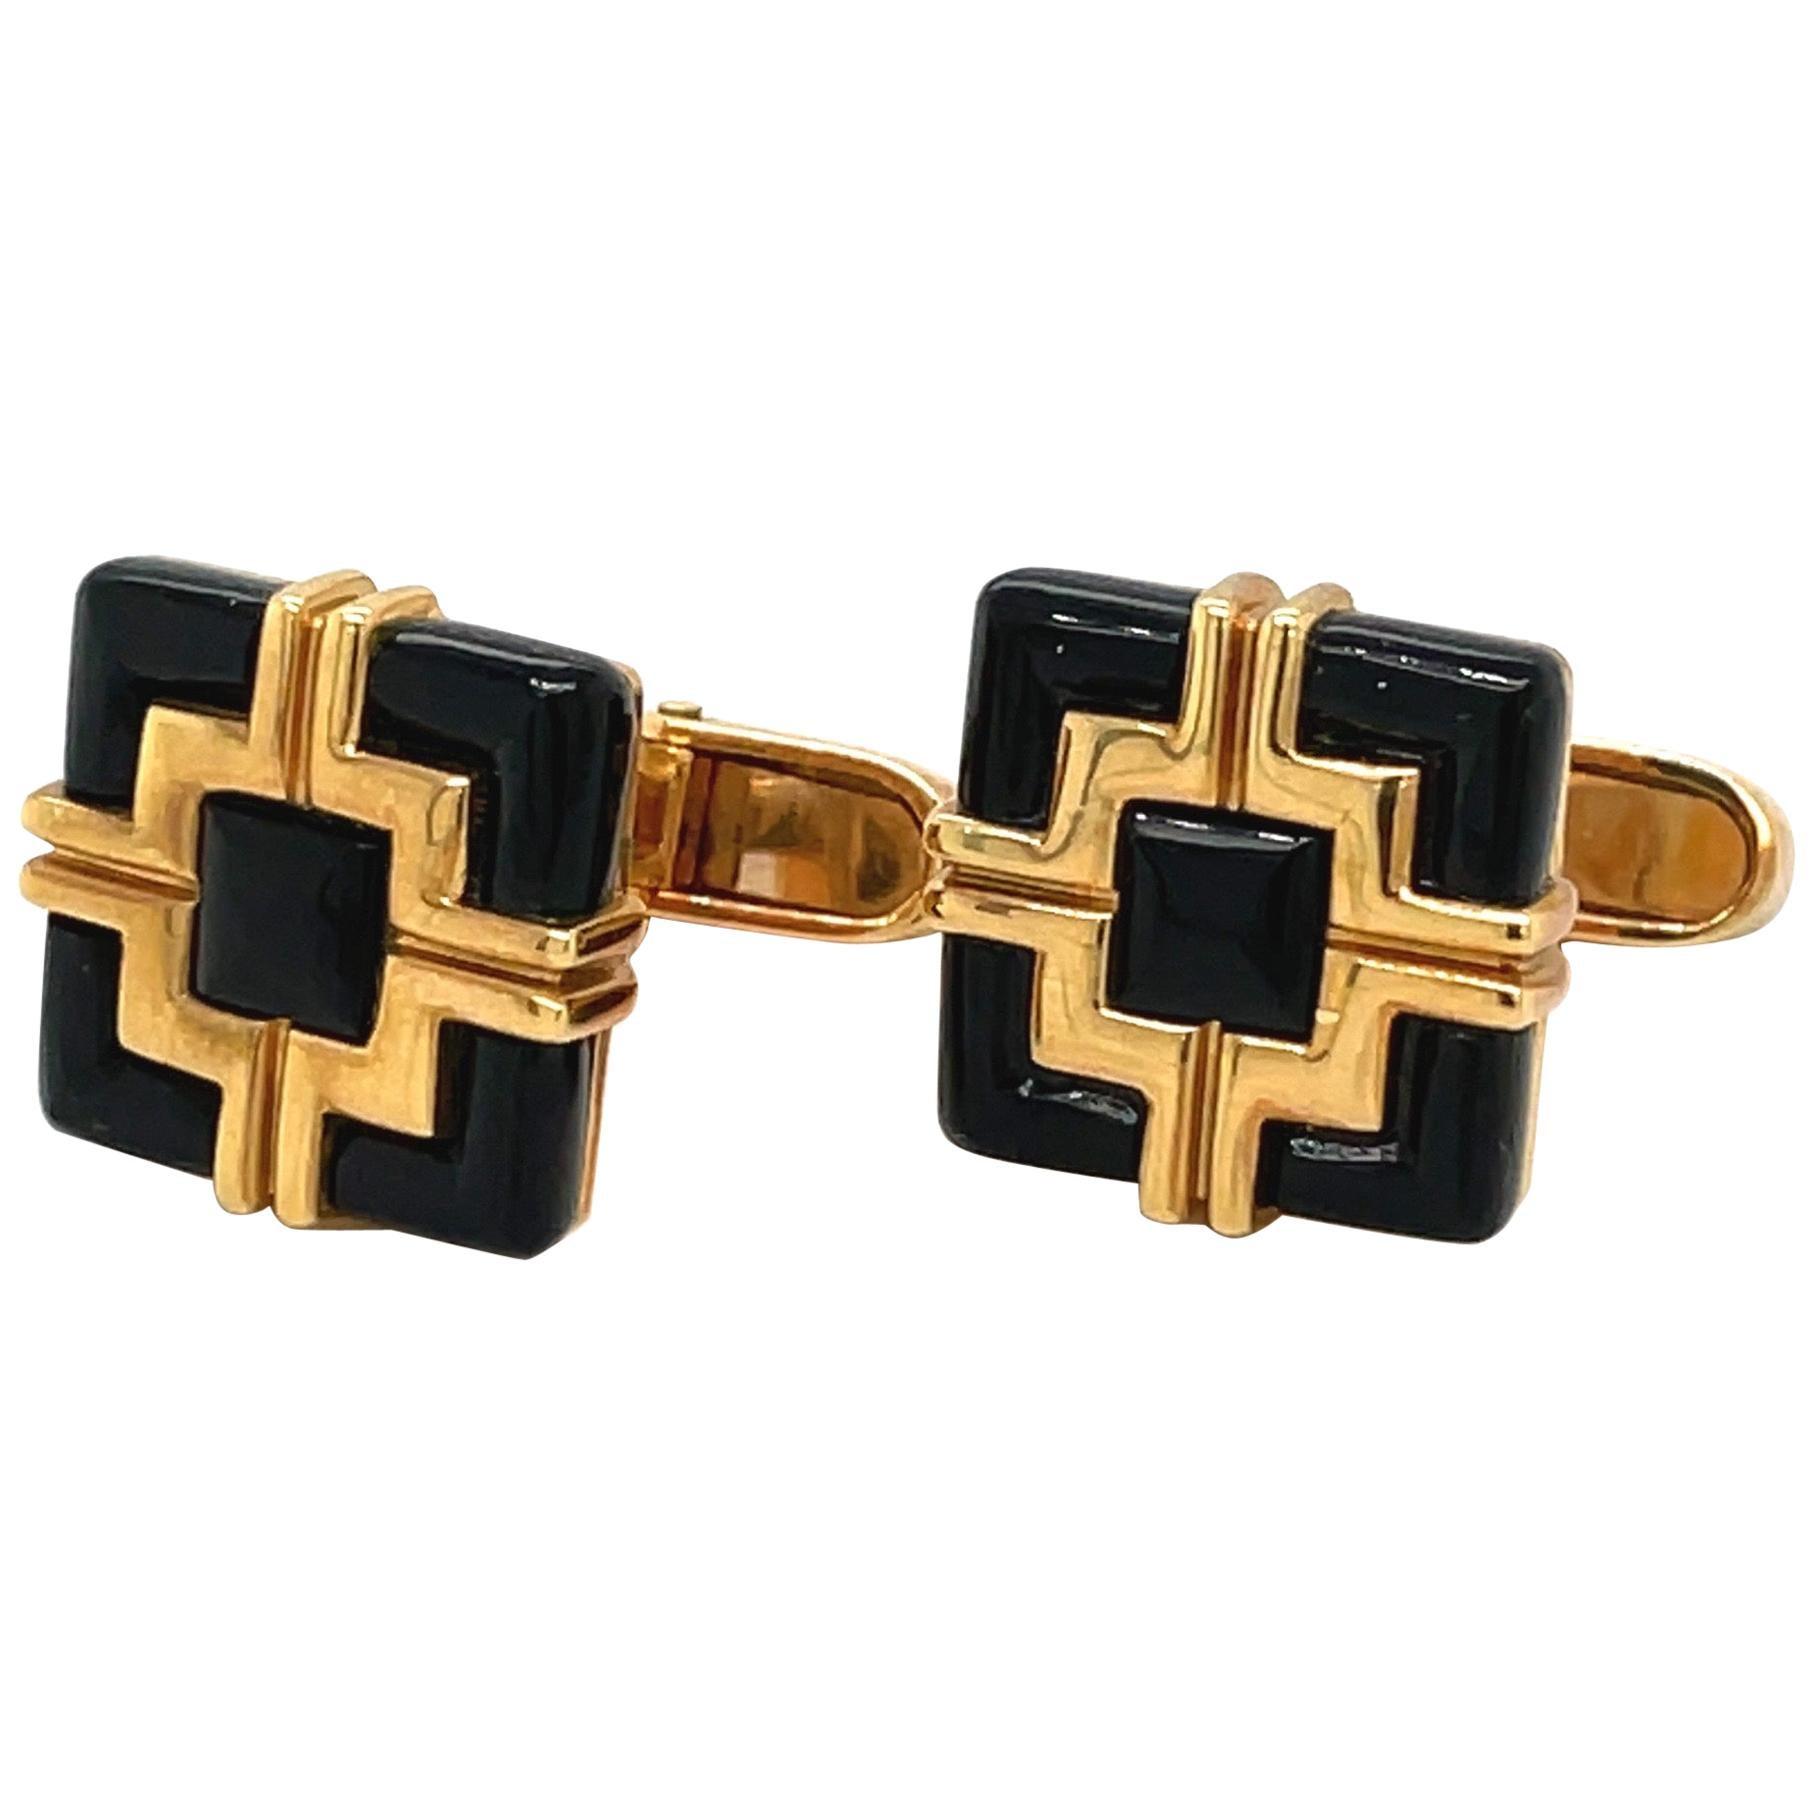 George Gero 18KT Yellow Gold Black Onyx Geometric Cuff Links